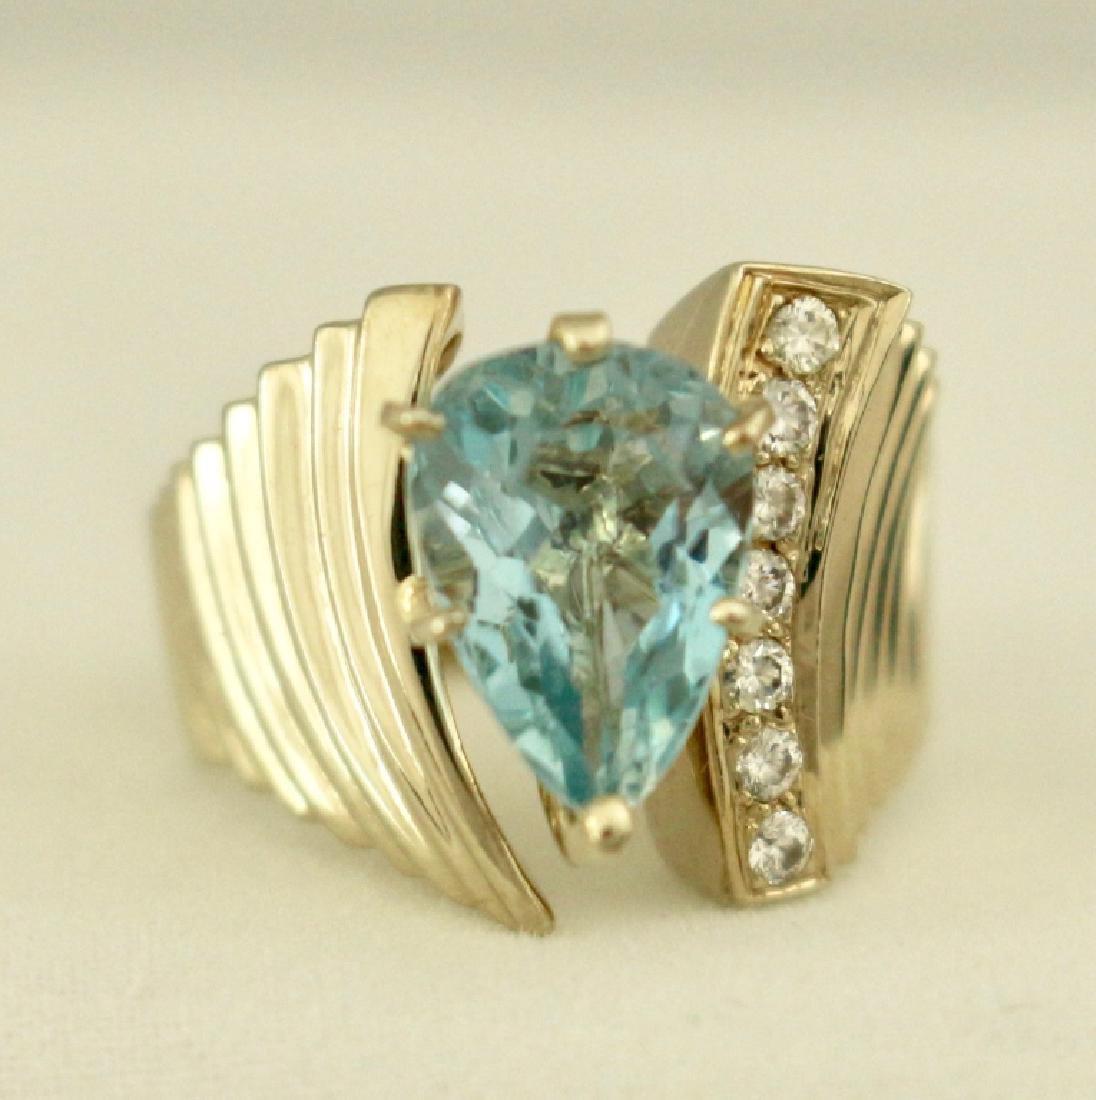 14K Gold and Aquamarine Ring